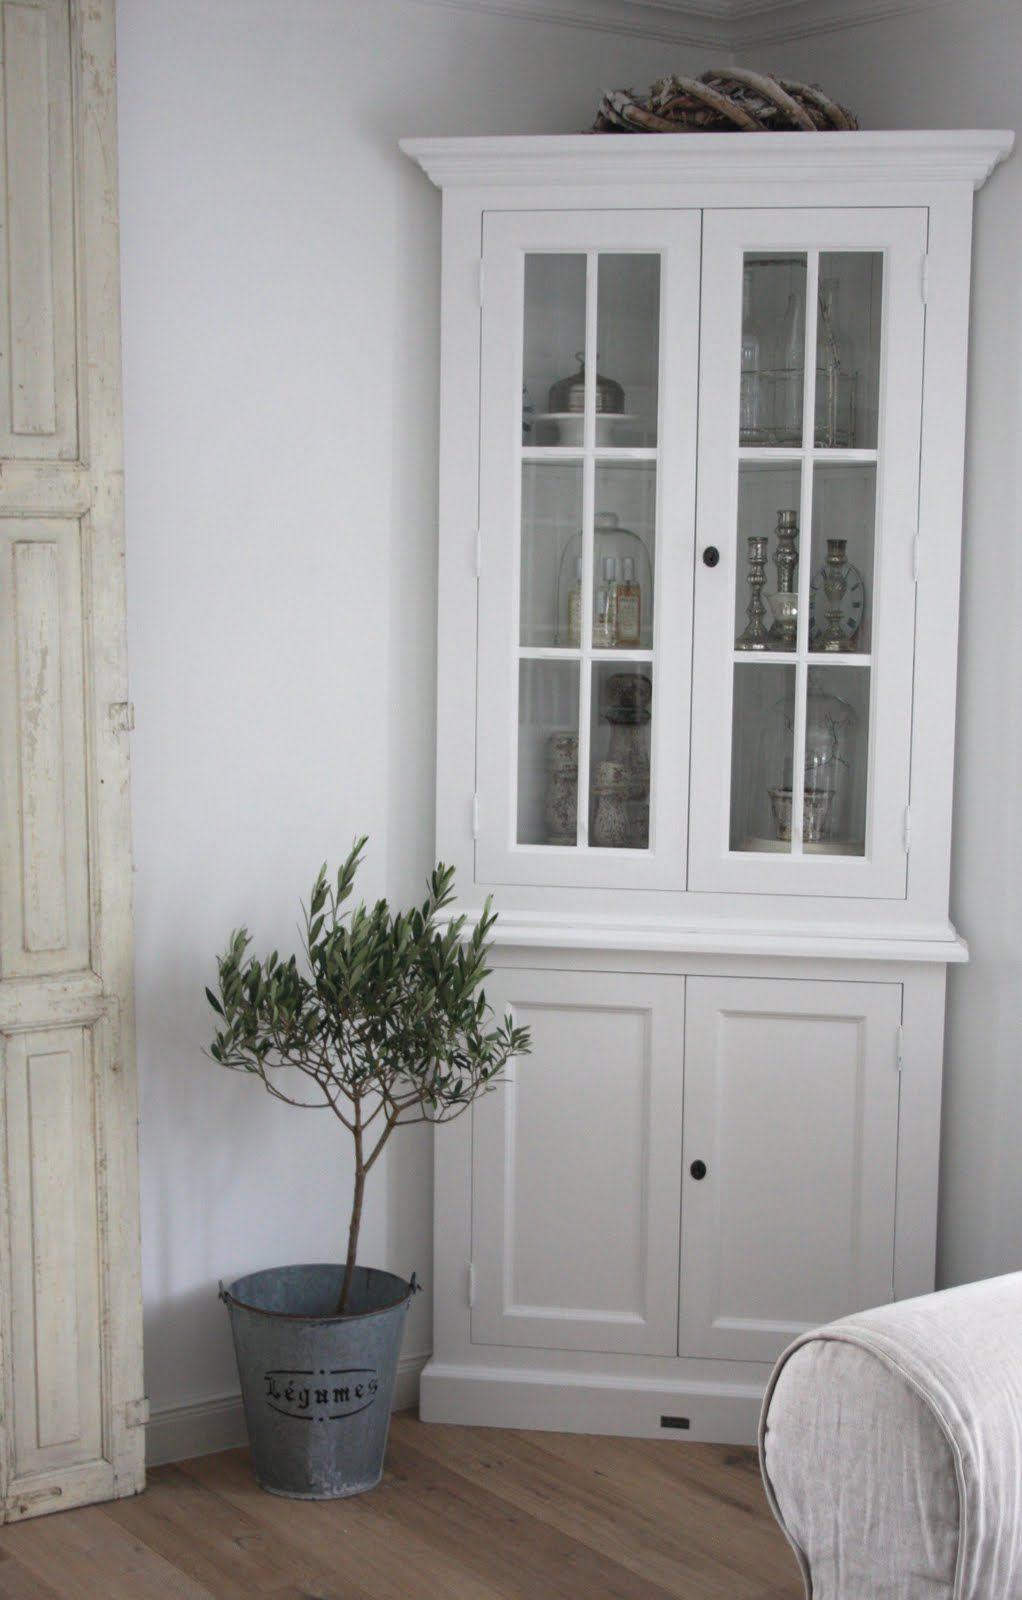 Shabby Homestyles Corner Cabinet  Interior Decor  Pinterest Prepossessing Small Corner Cabinets Dining Room Inspiration